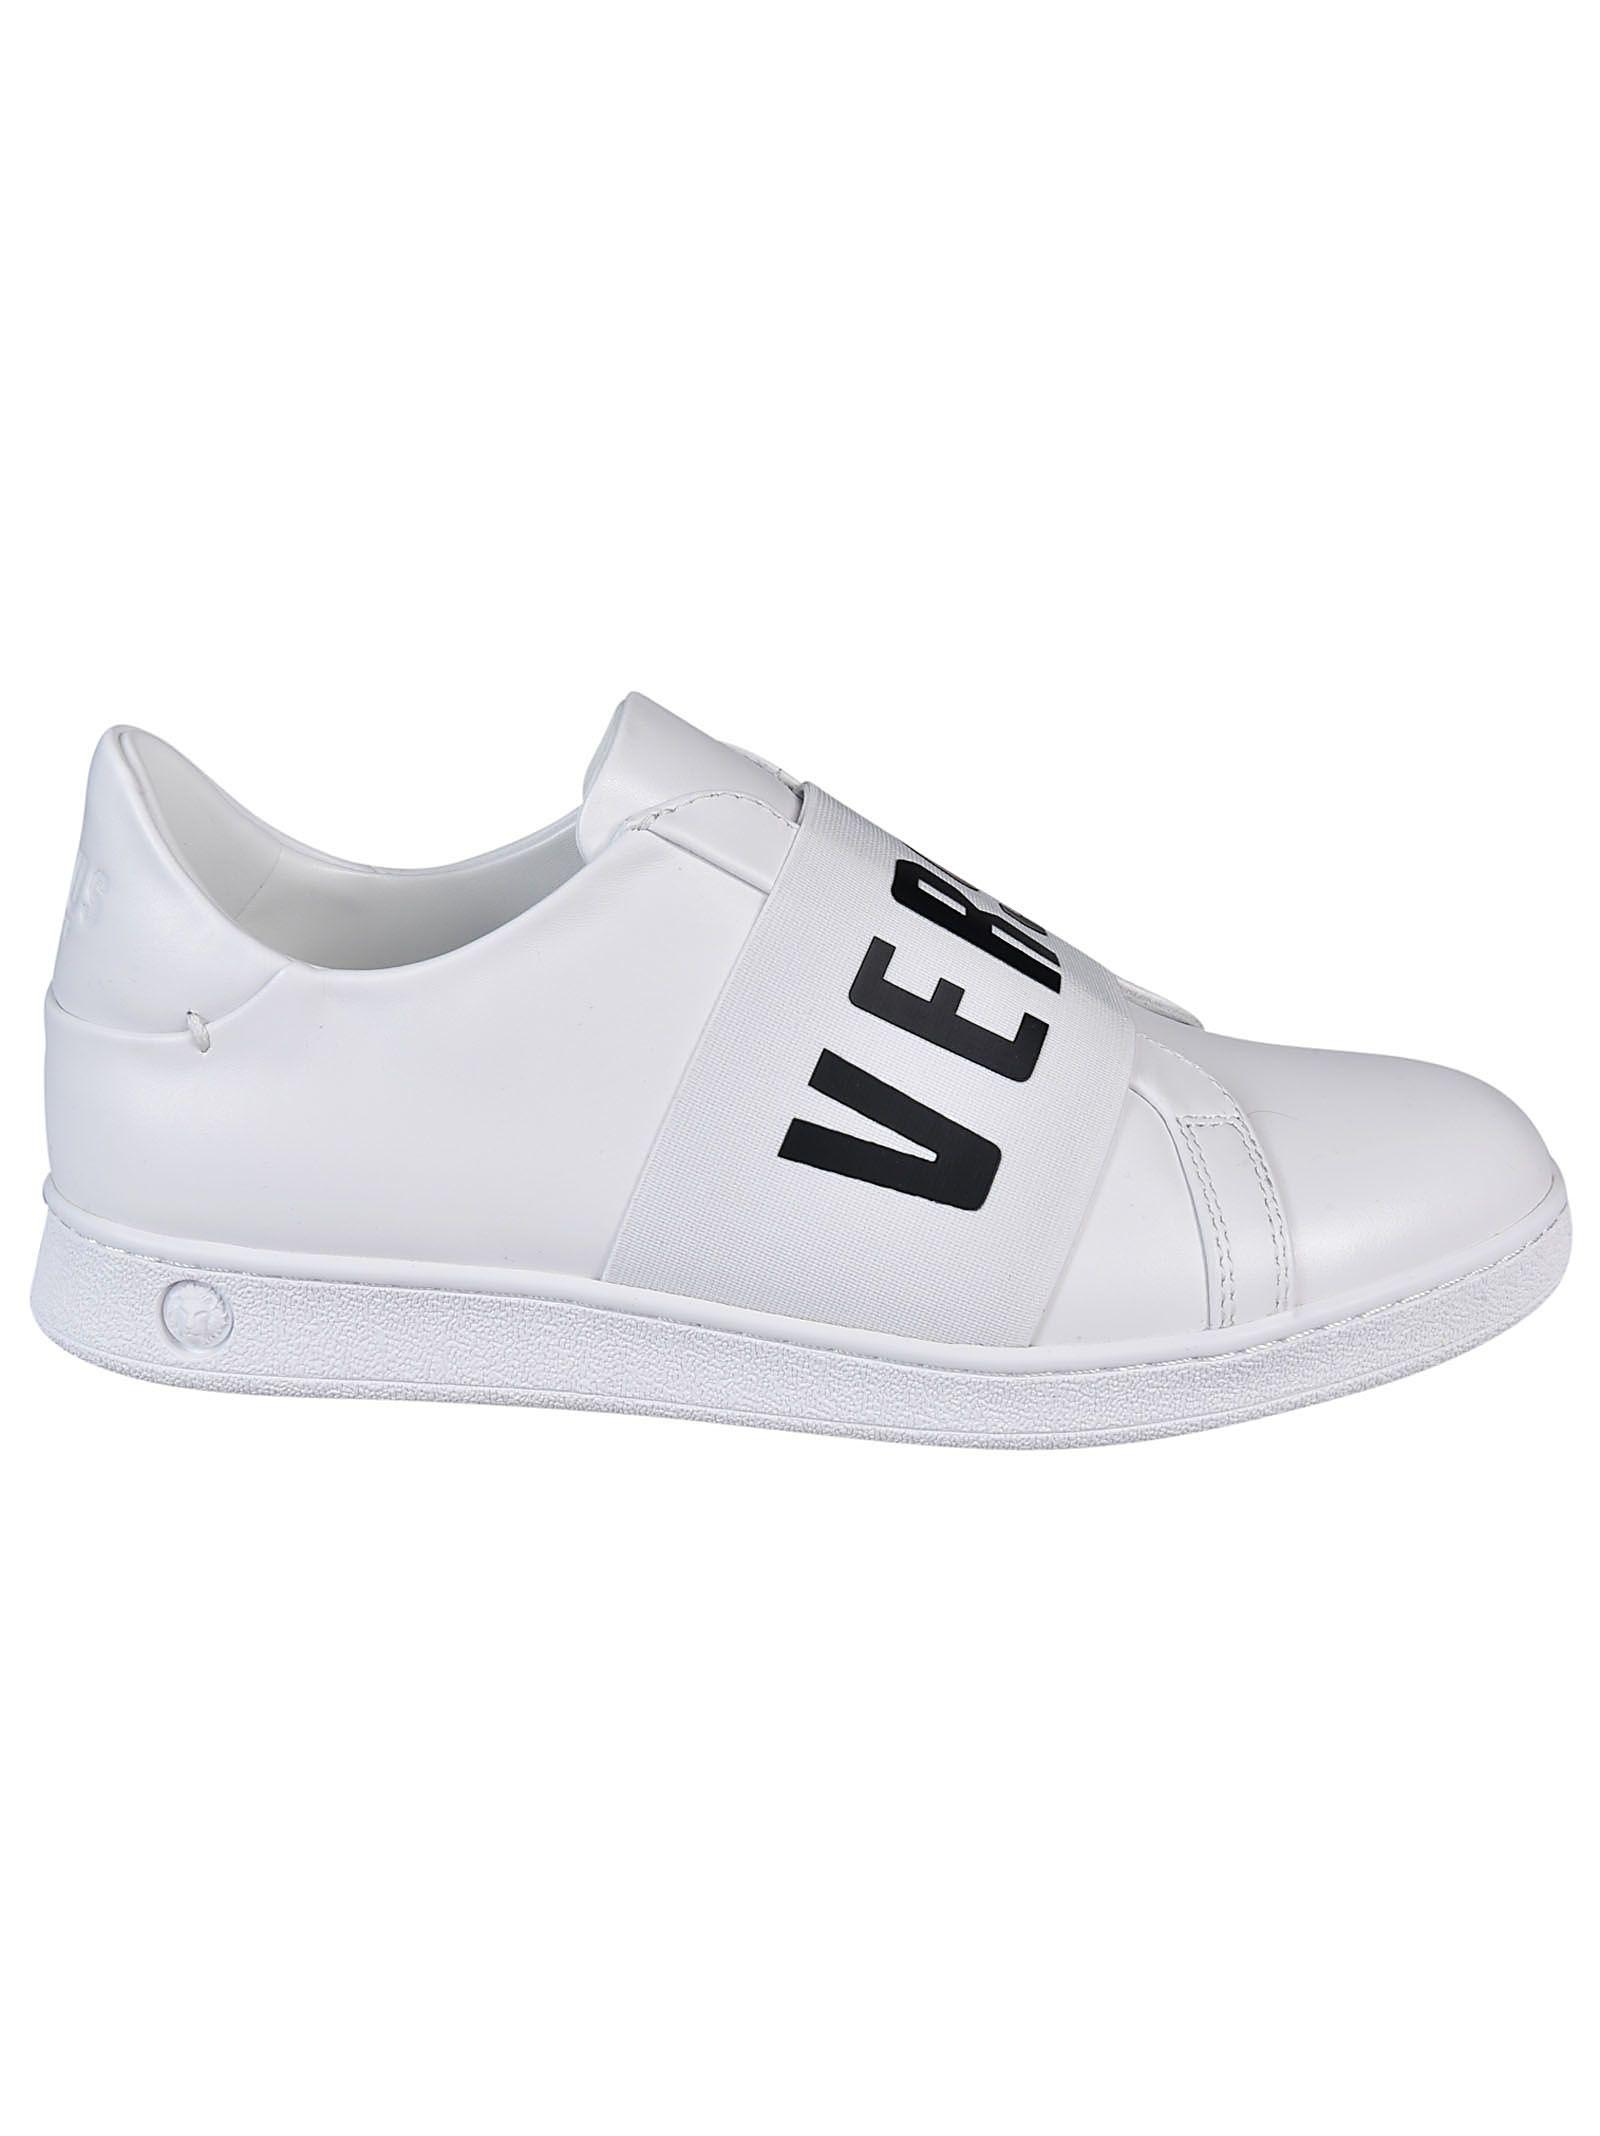 Versus Logo Strap Slip-on Sneakers